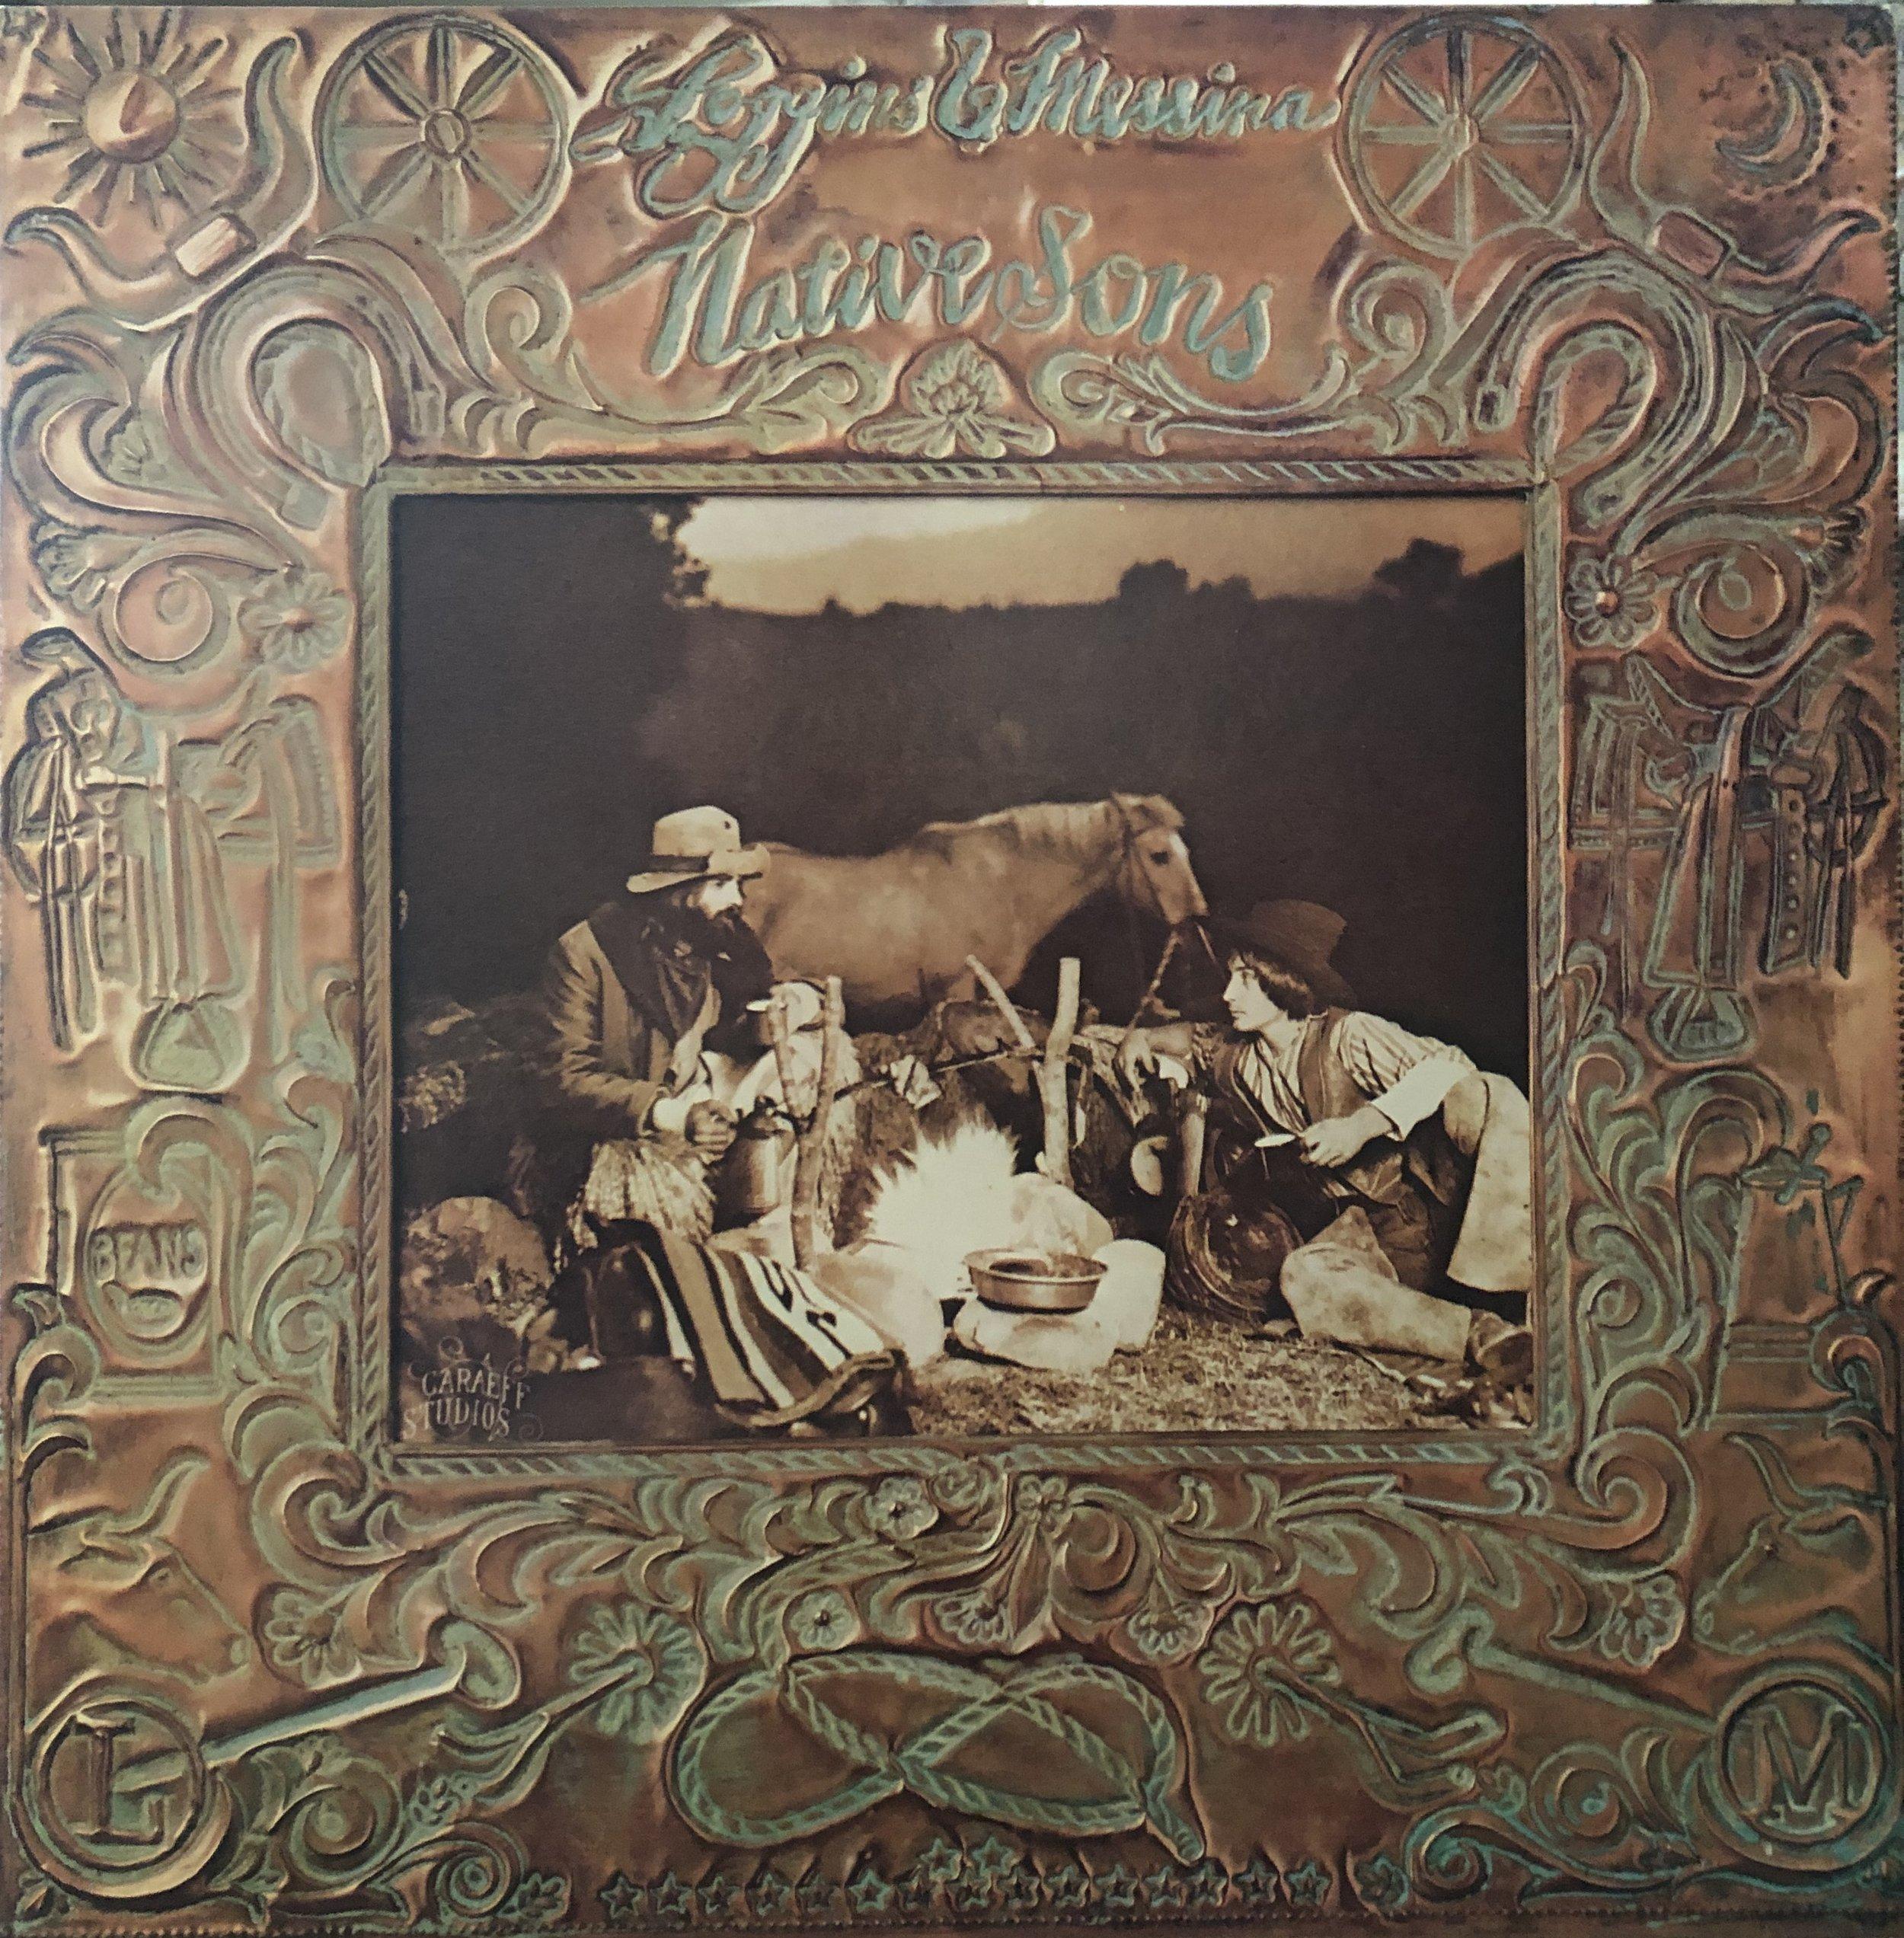 1976 Native Sons.jpg